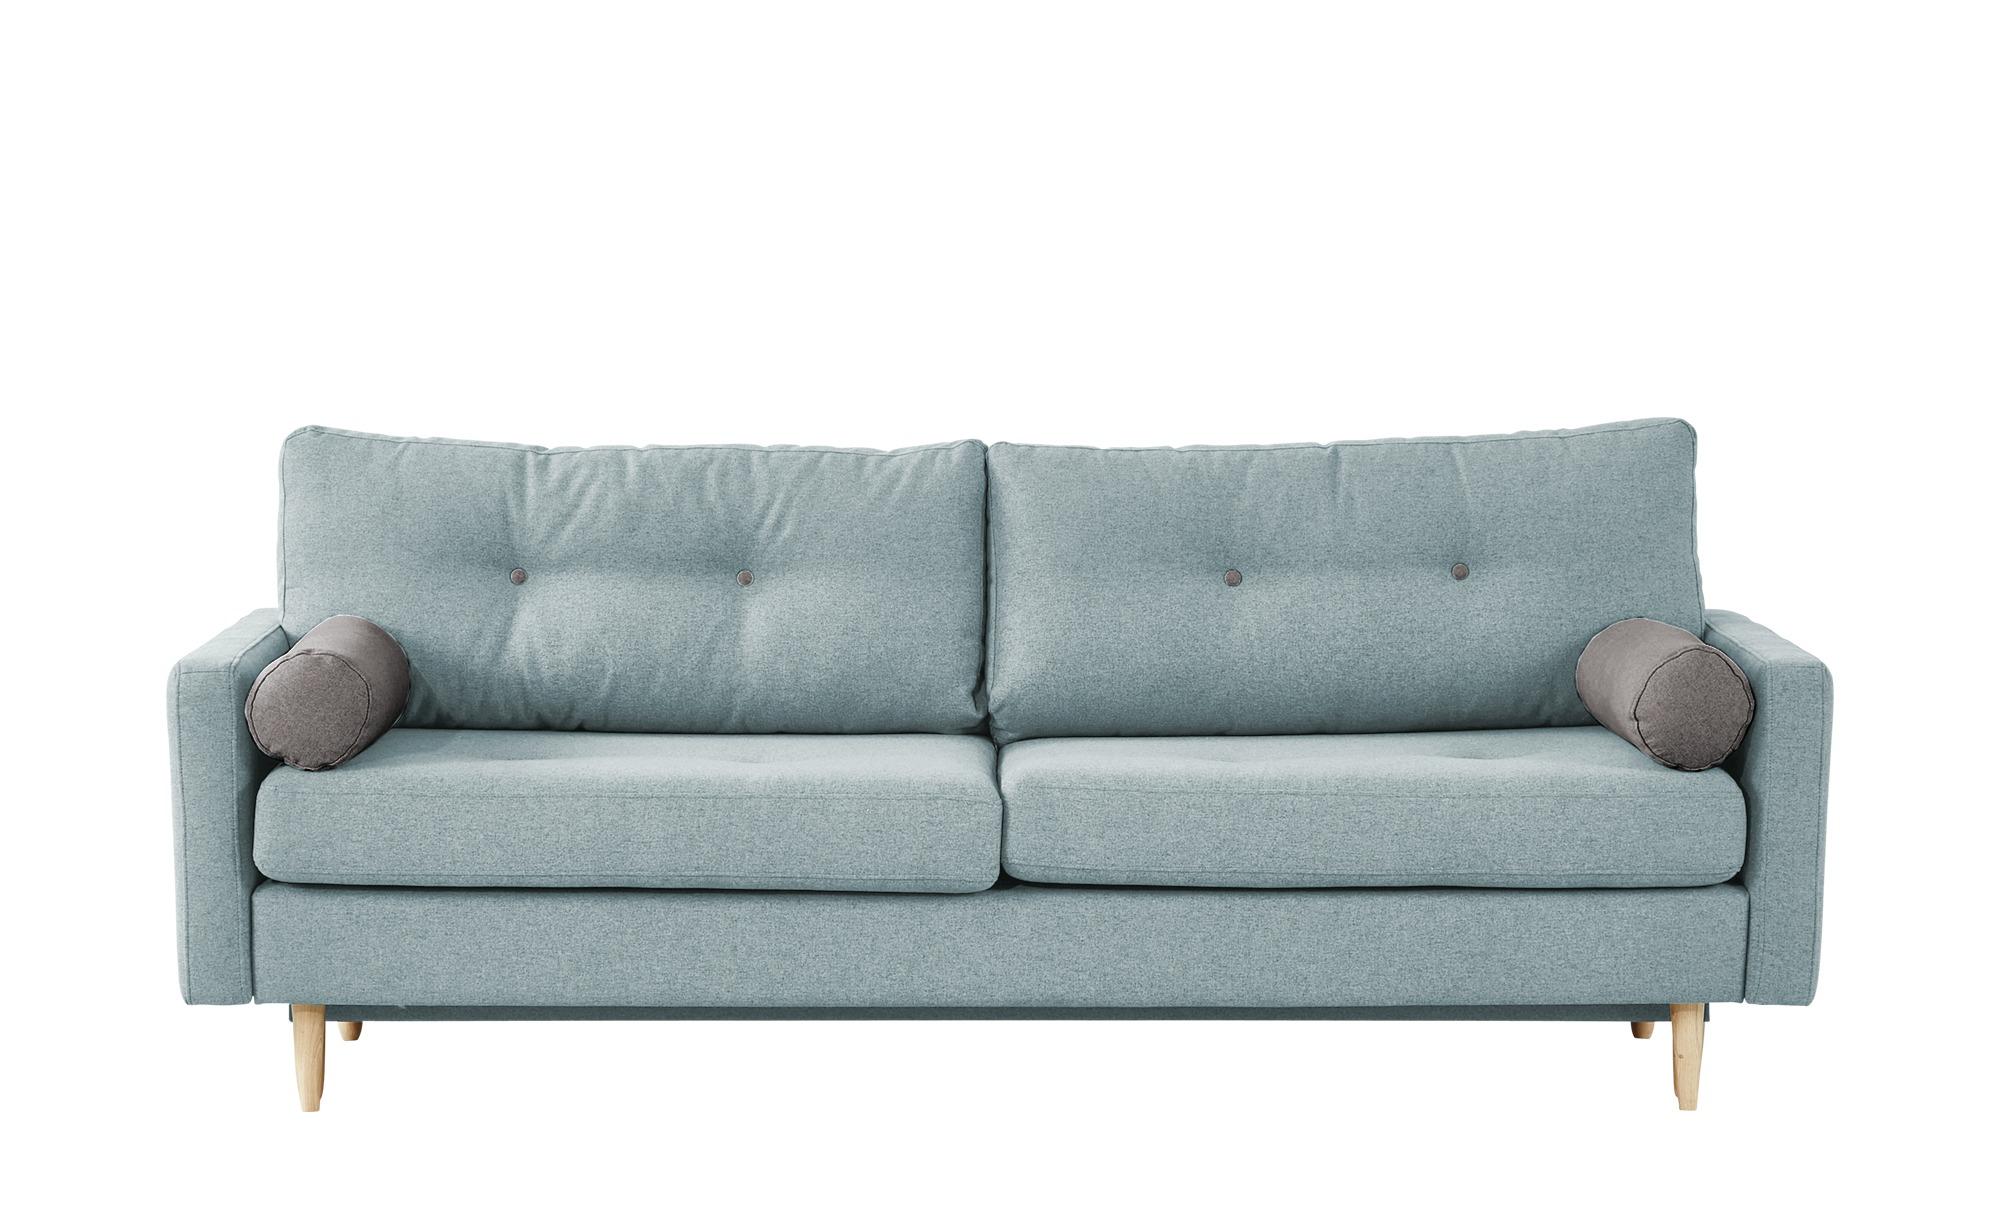 finya Design-Schlafsofa 3-sitzig mintgrün - Webstoff Pure ¦ Maße (cm): B: 218 H: 85 T: 93 Polstermöbel > Sofas > 3-Sitzer - Höffner